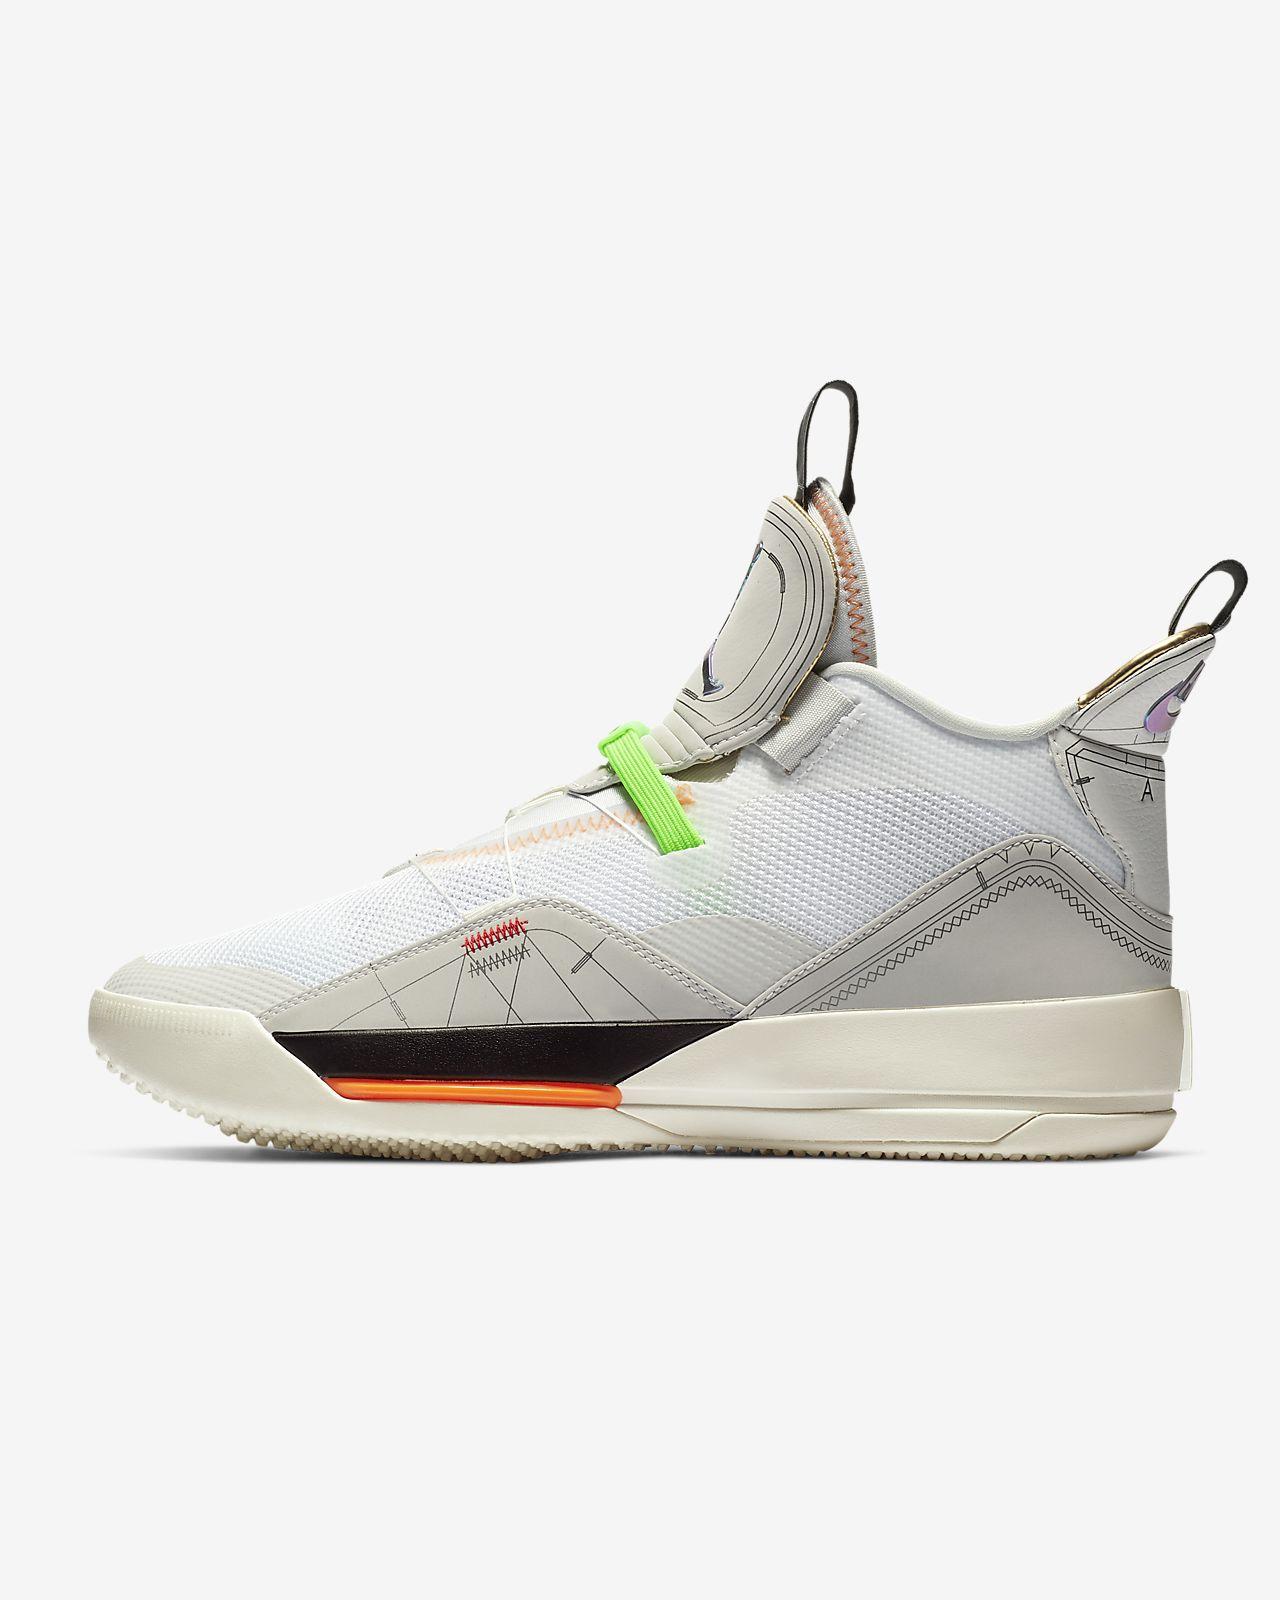 De HommeBe Jordan Air Pour Basketball Chaussure Xxxiii rdQCxBoeWE